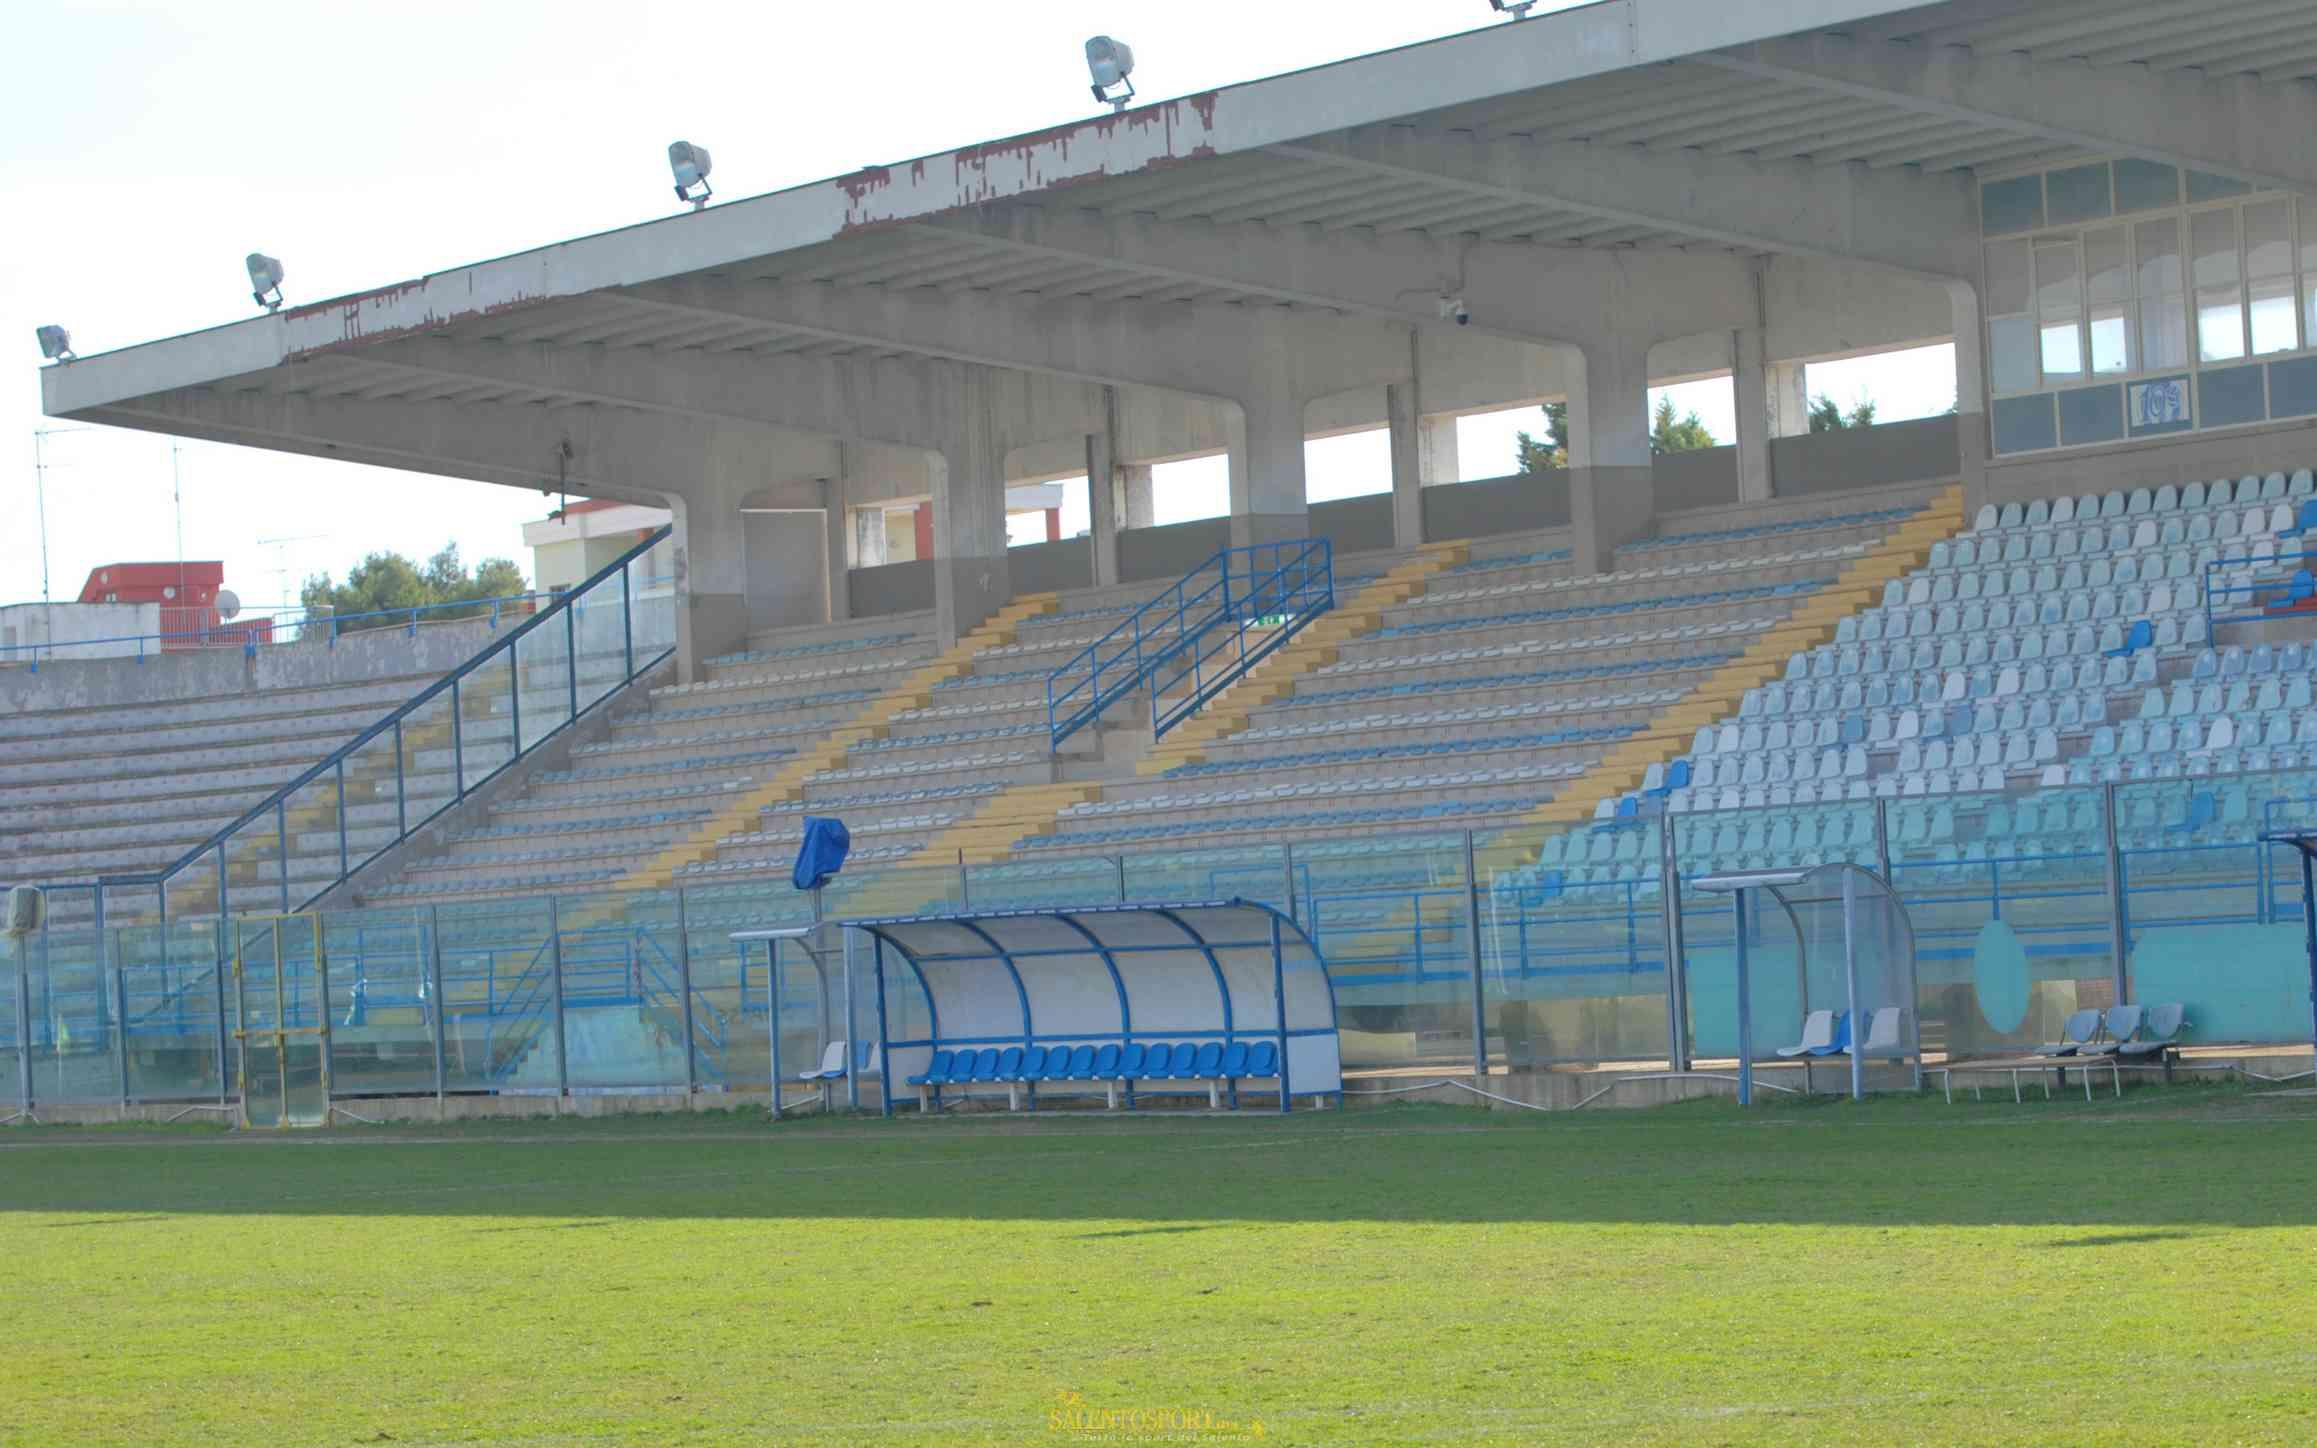 stadio-fanuzzi-brindisi-vuoto ph g di campi